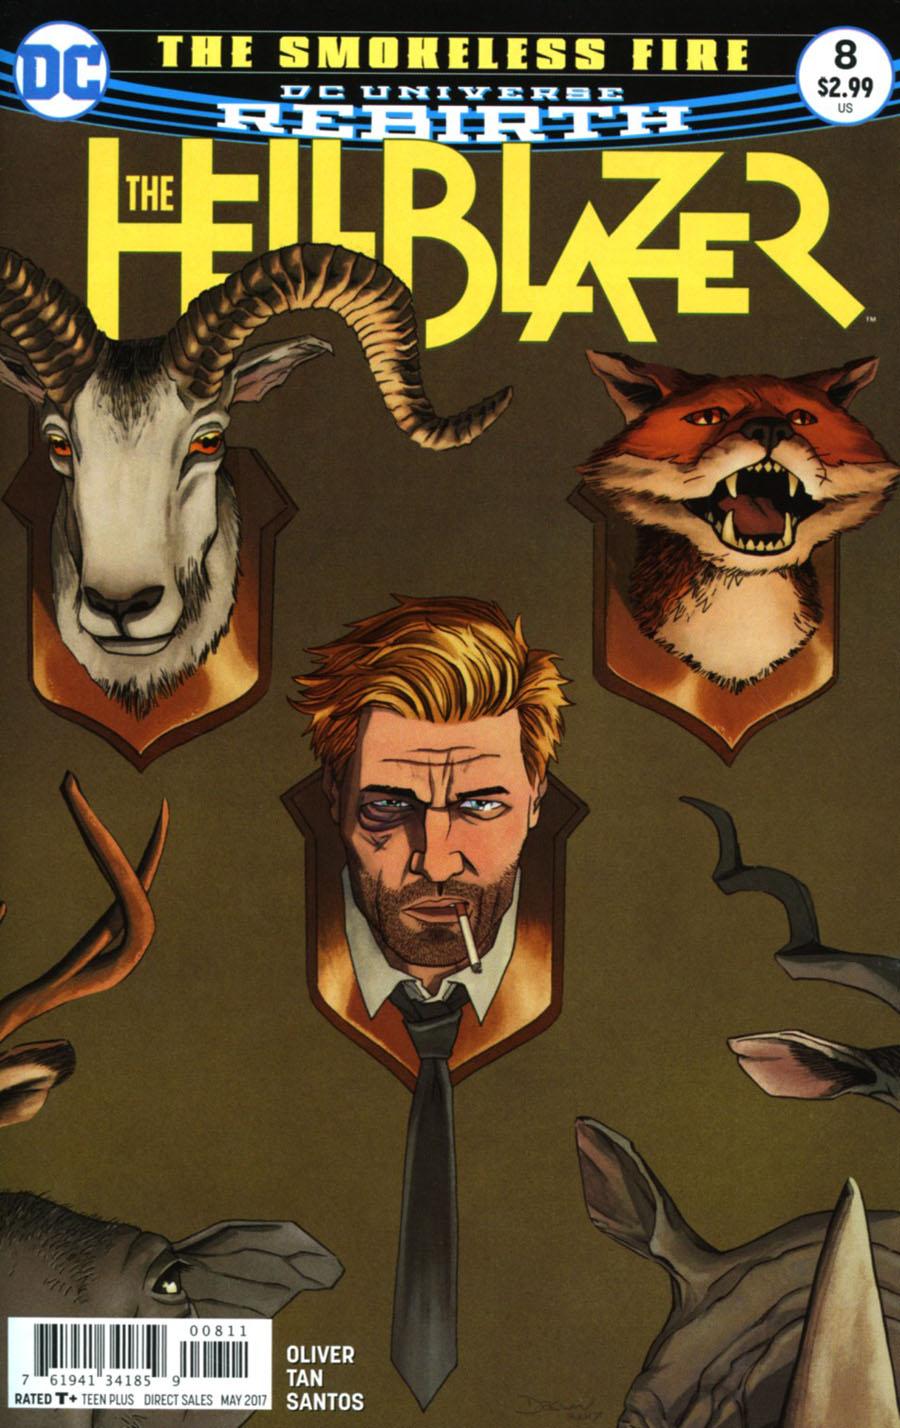 Hellblazer Vol 2 #8 Cover A Regular John Cassaday Cover